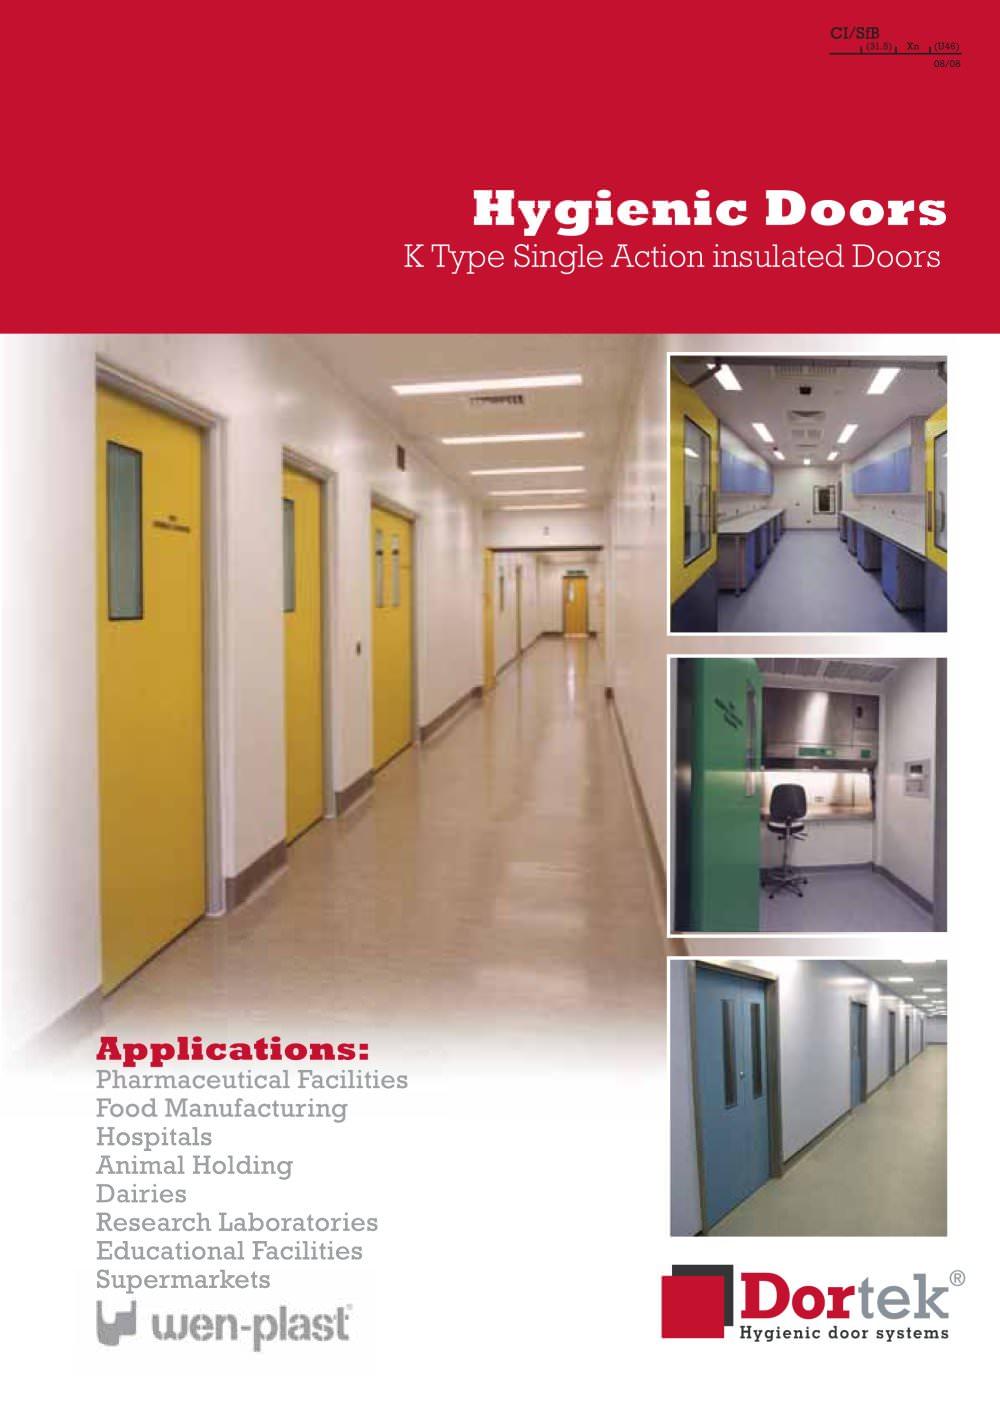 K-Door Single Action - 1 / 4 Pages  sc 1 st  Catalogues Medicalexpo & K-Door Single Action - Dortek - PDF Catalogue   Technical ... pezcame.com